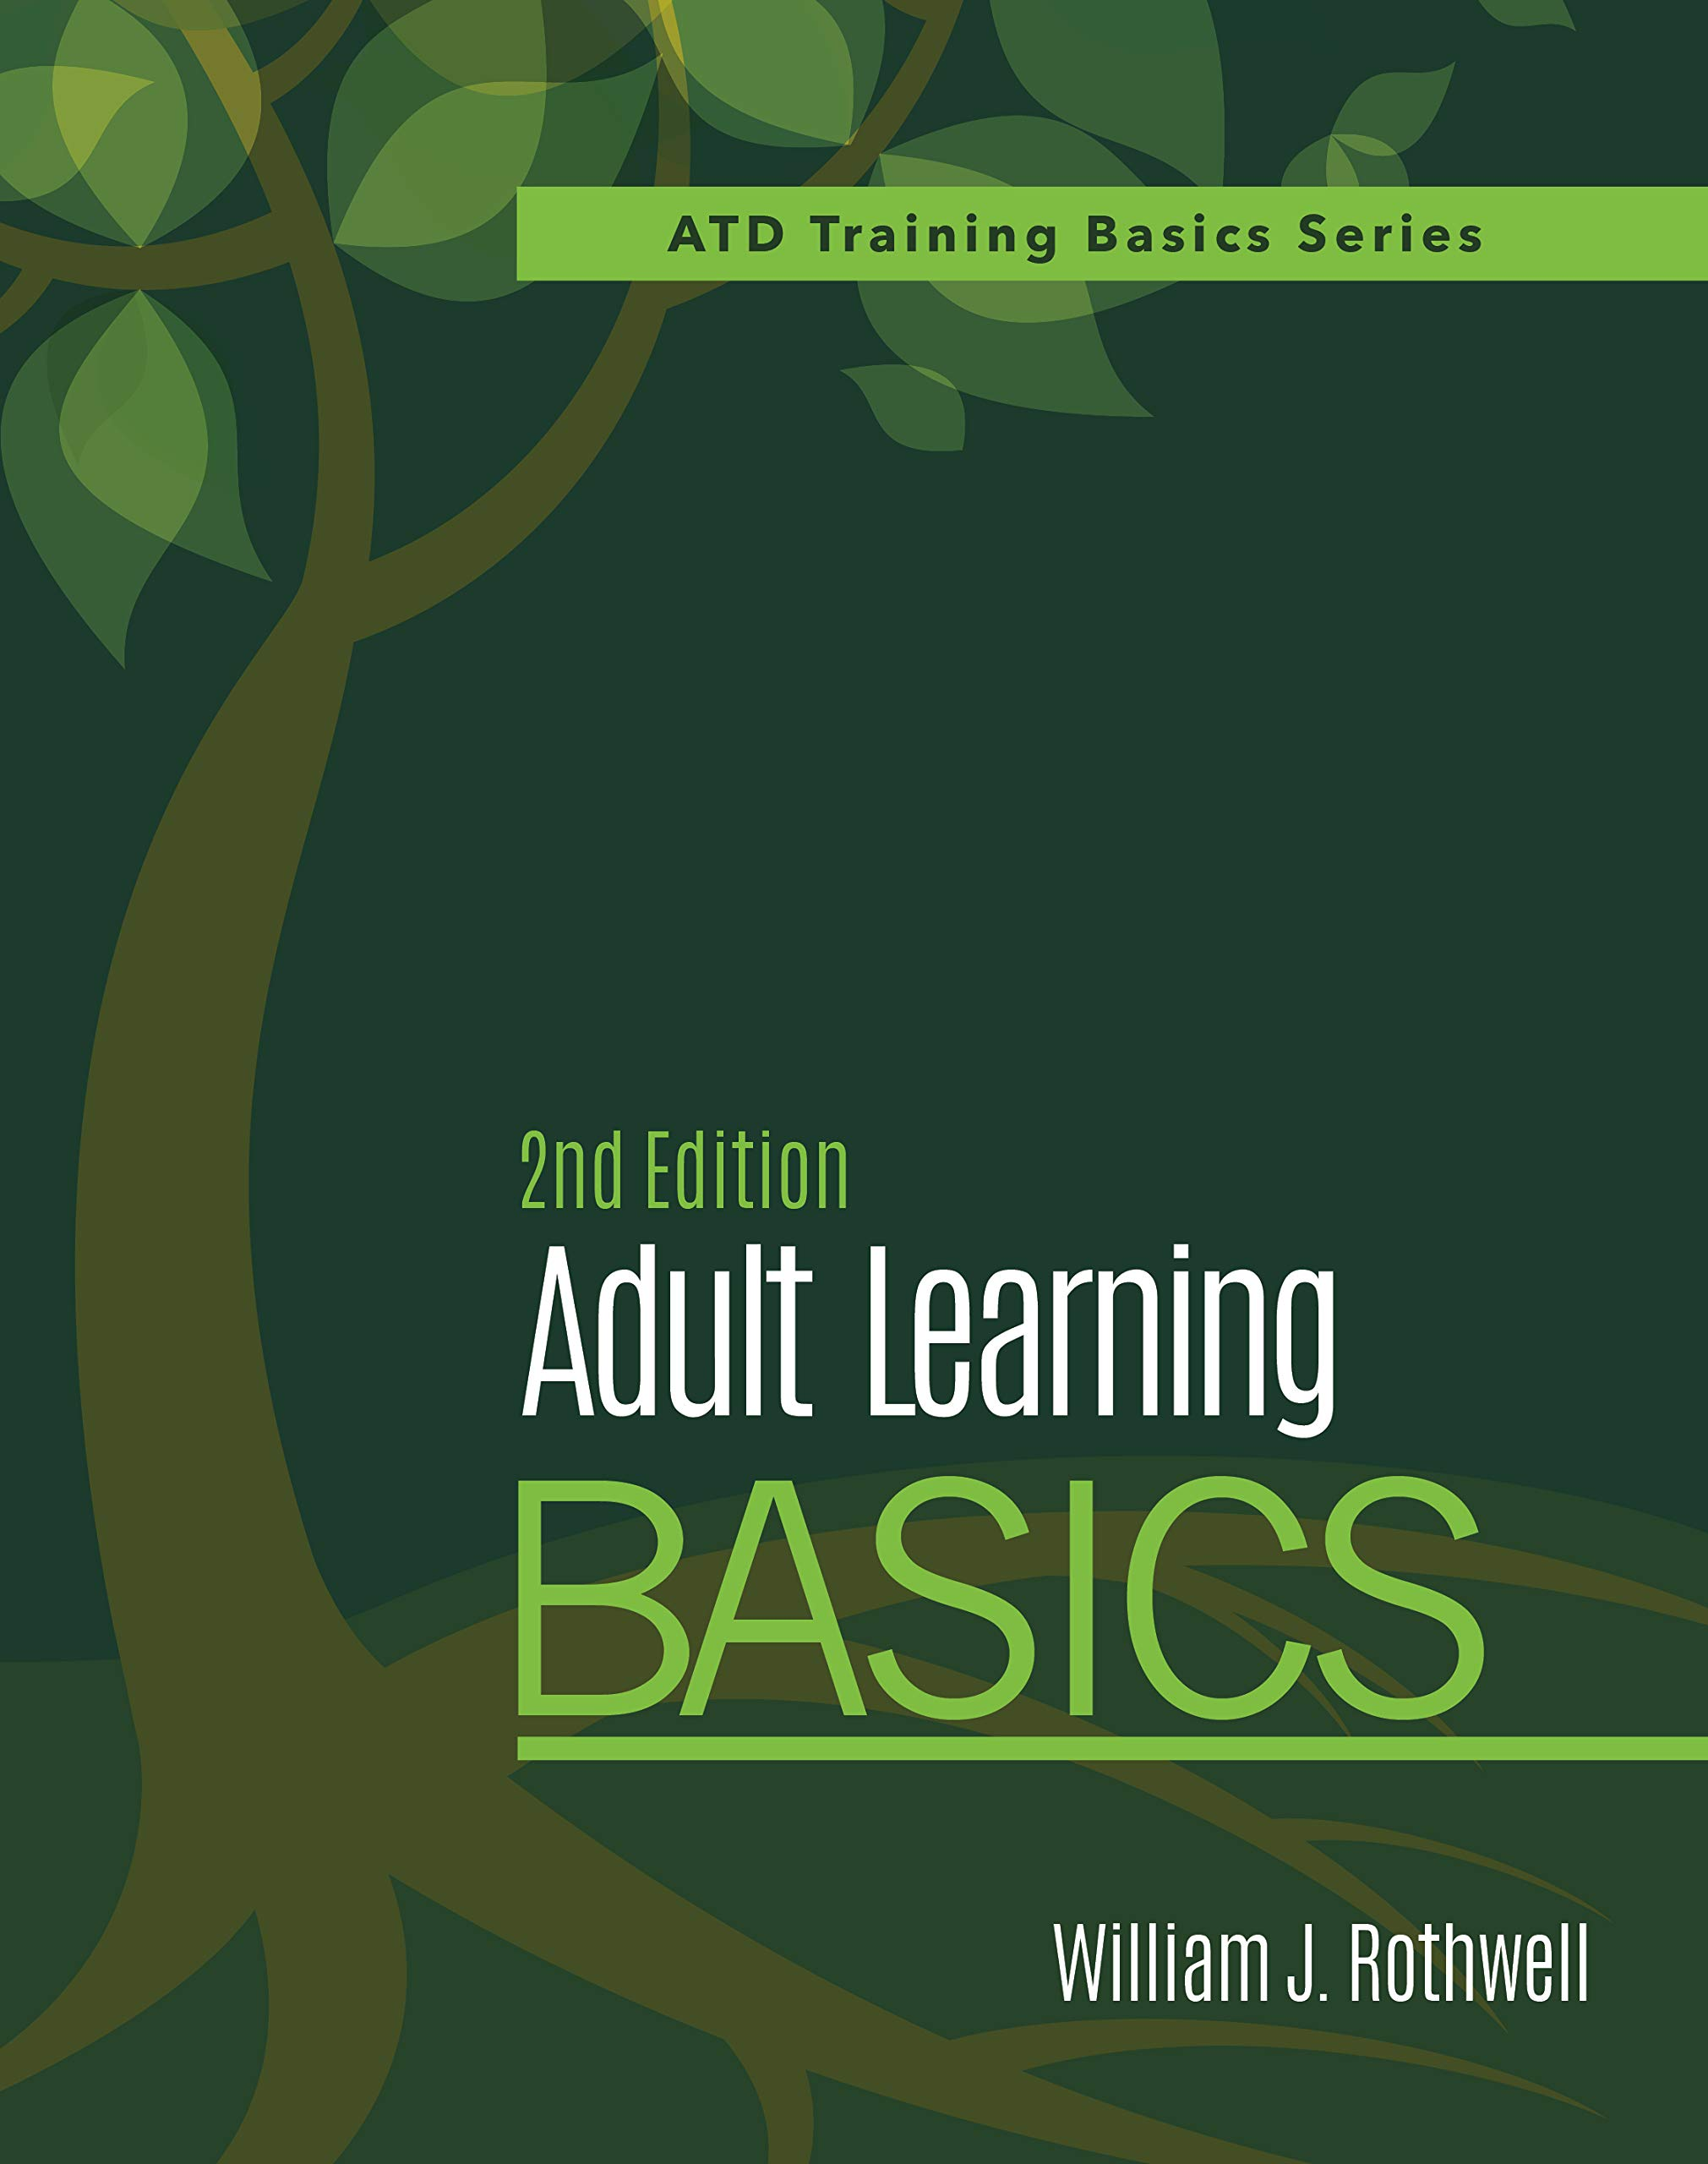 Adult Learning Basics, 2nd edition